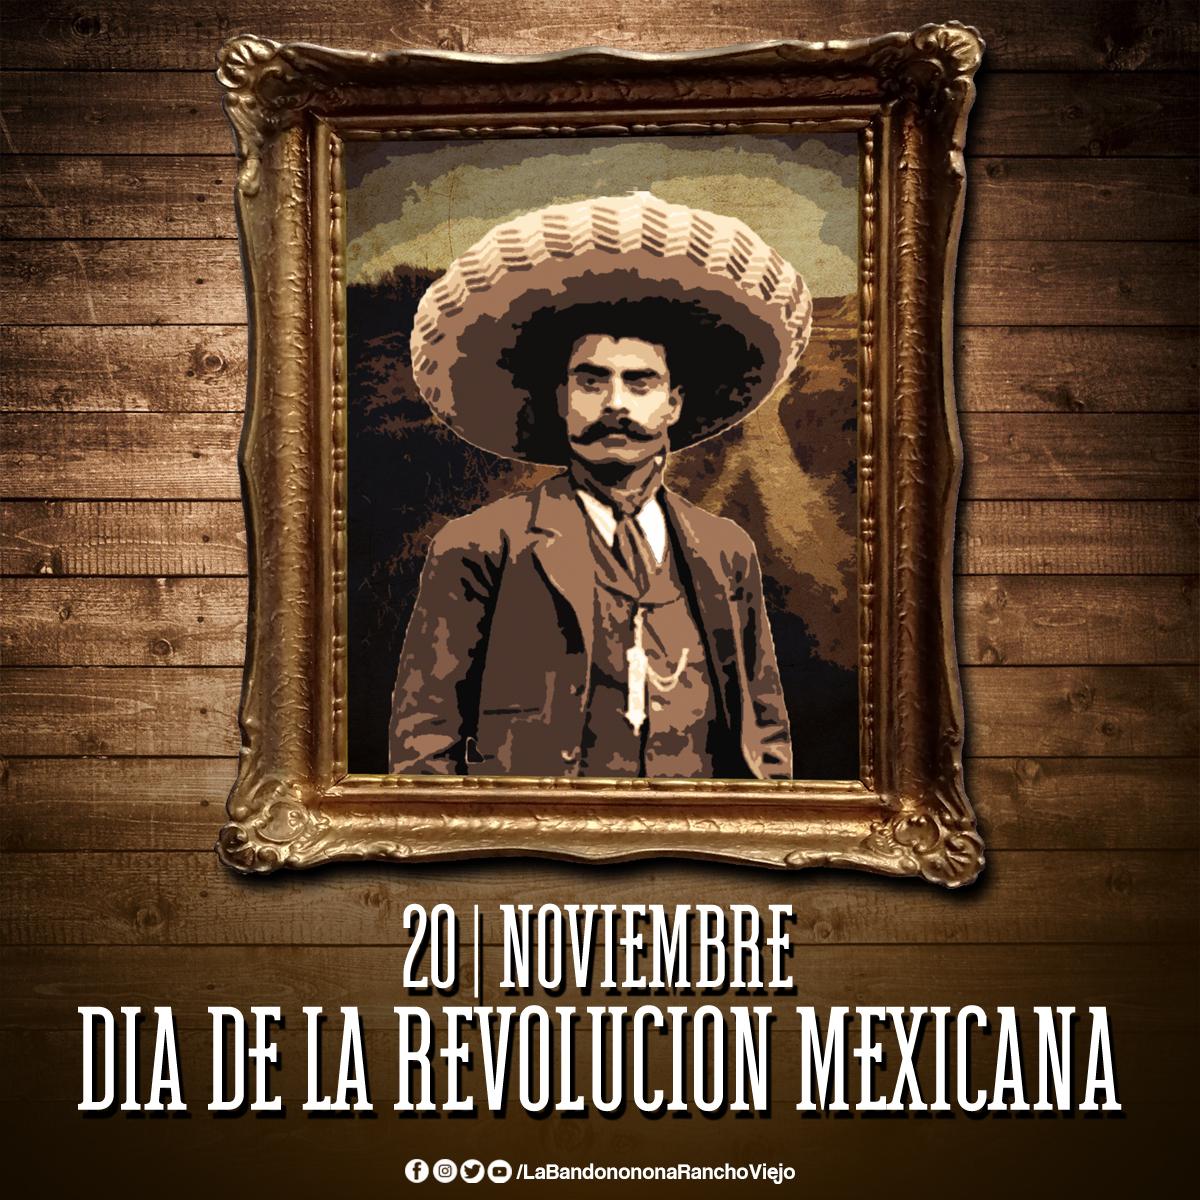 ¡Hoy se conmemoran 110 años de la Revolución Mexicana!🇲🇽🤠 Síguenos👉 @B_RanchoViejo  #DíaDeLaRevolucionMexicana #QueLeHace #LaBandononona https://t.co/T6OgvYcgHN